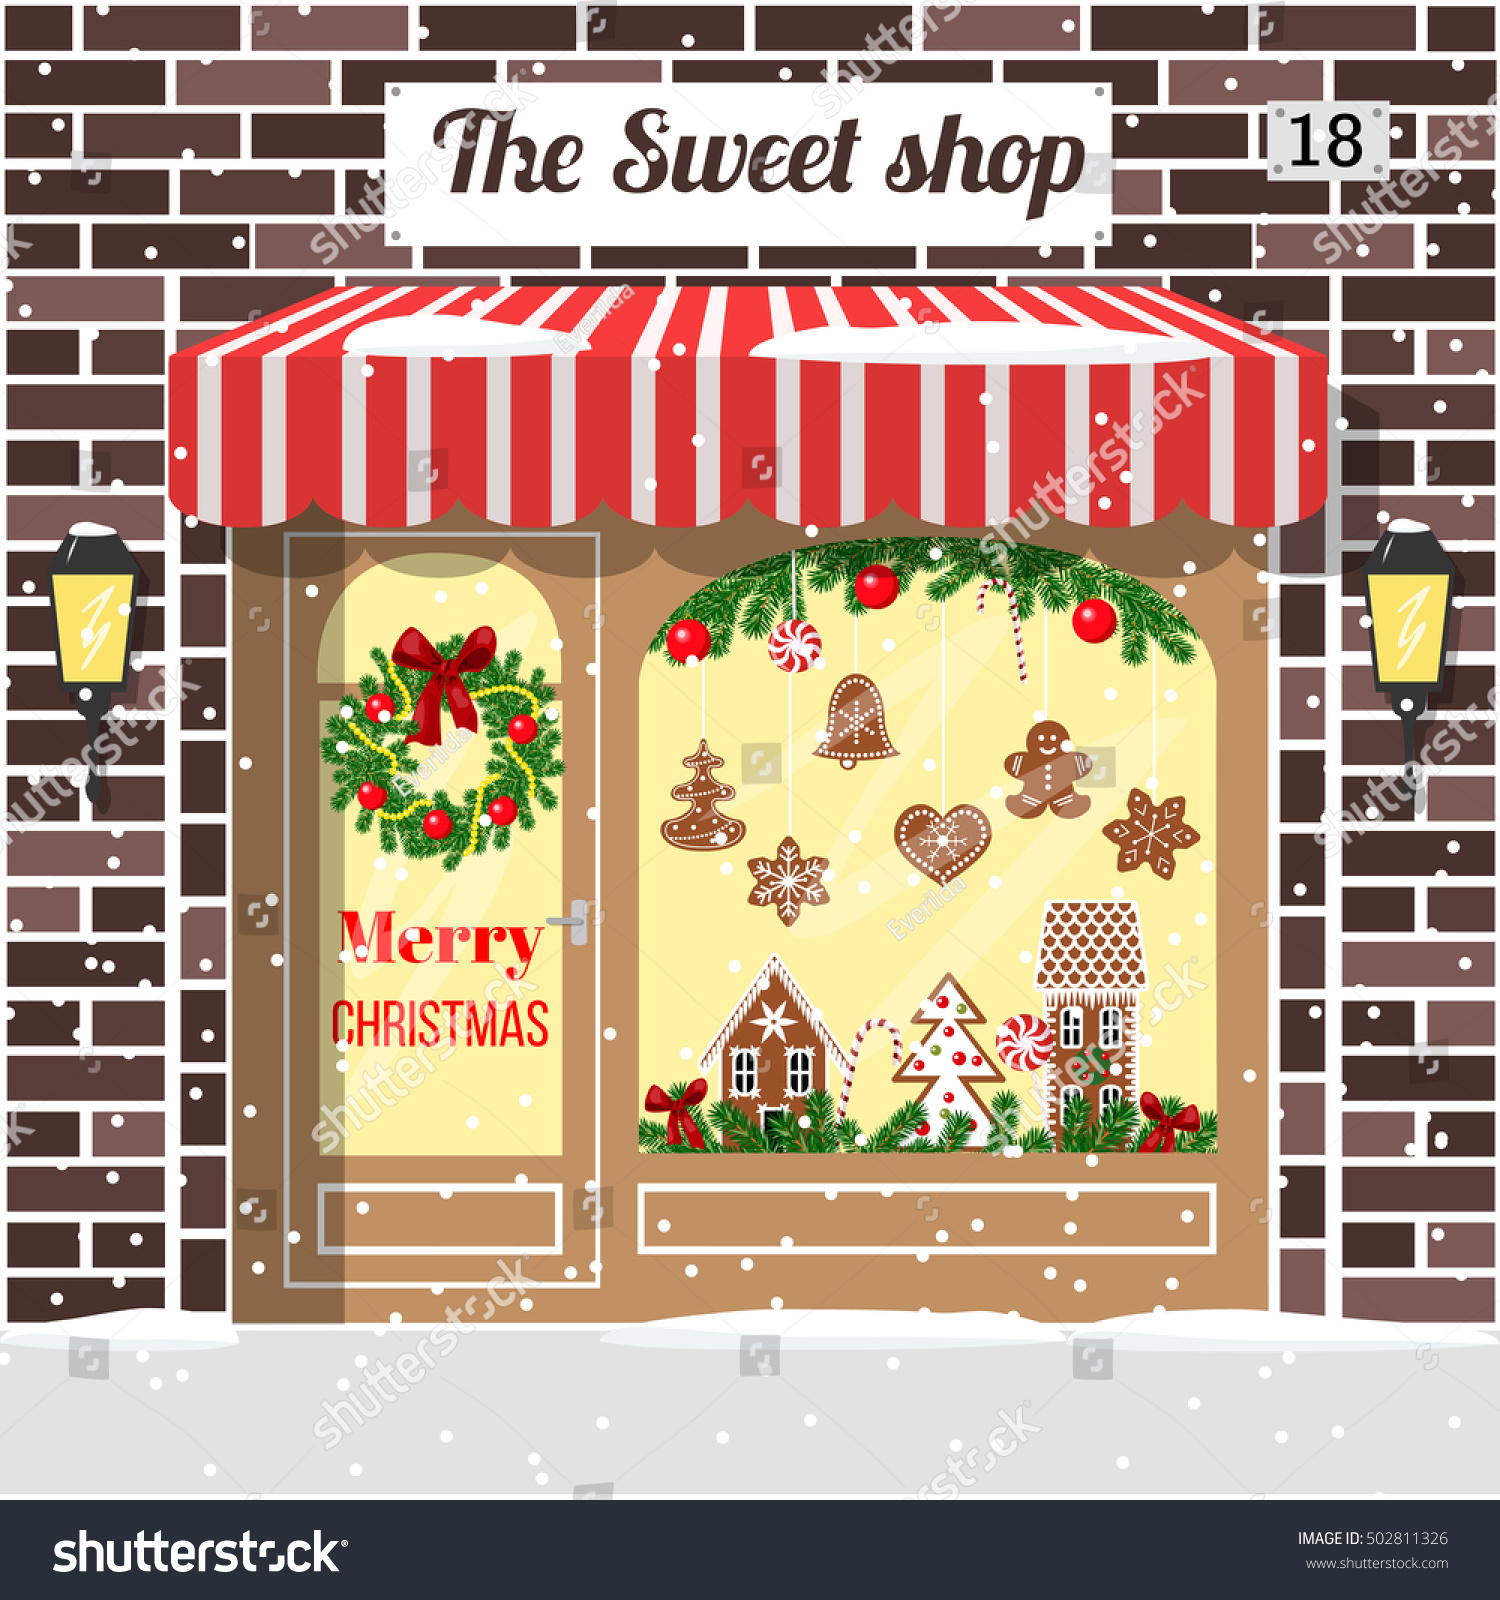 Christmas Room Stock Vector Image Of Illuminated: Christmas Decorated Illuminated Sweet Shop Candy Stock